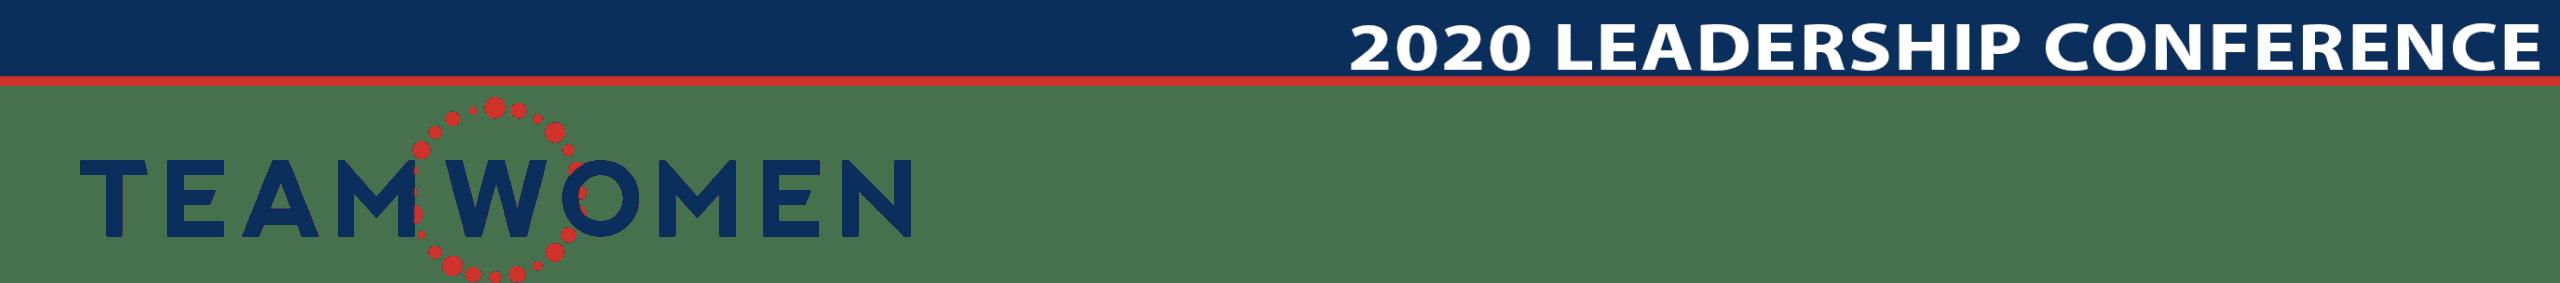 TeamWomen 2020 Leadership Conference